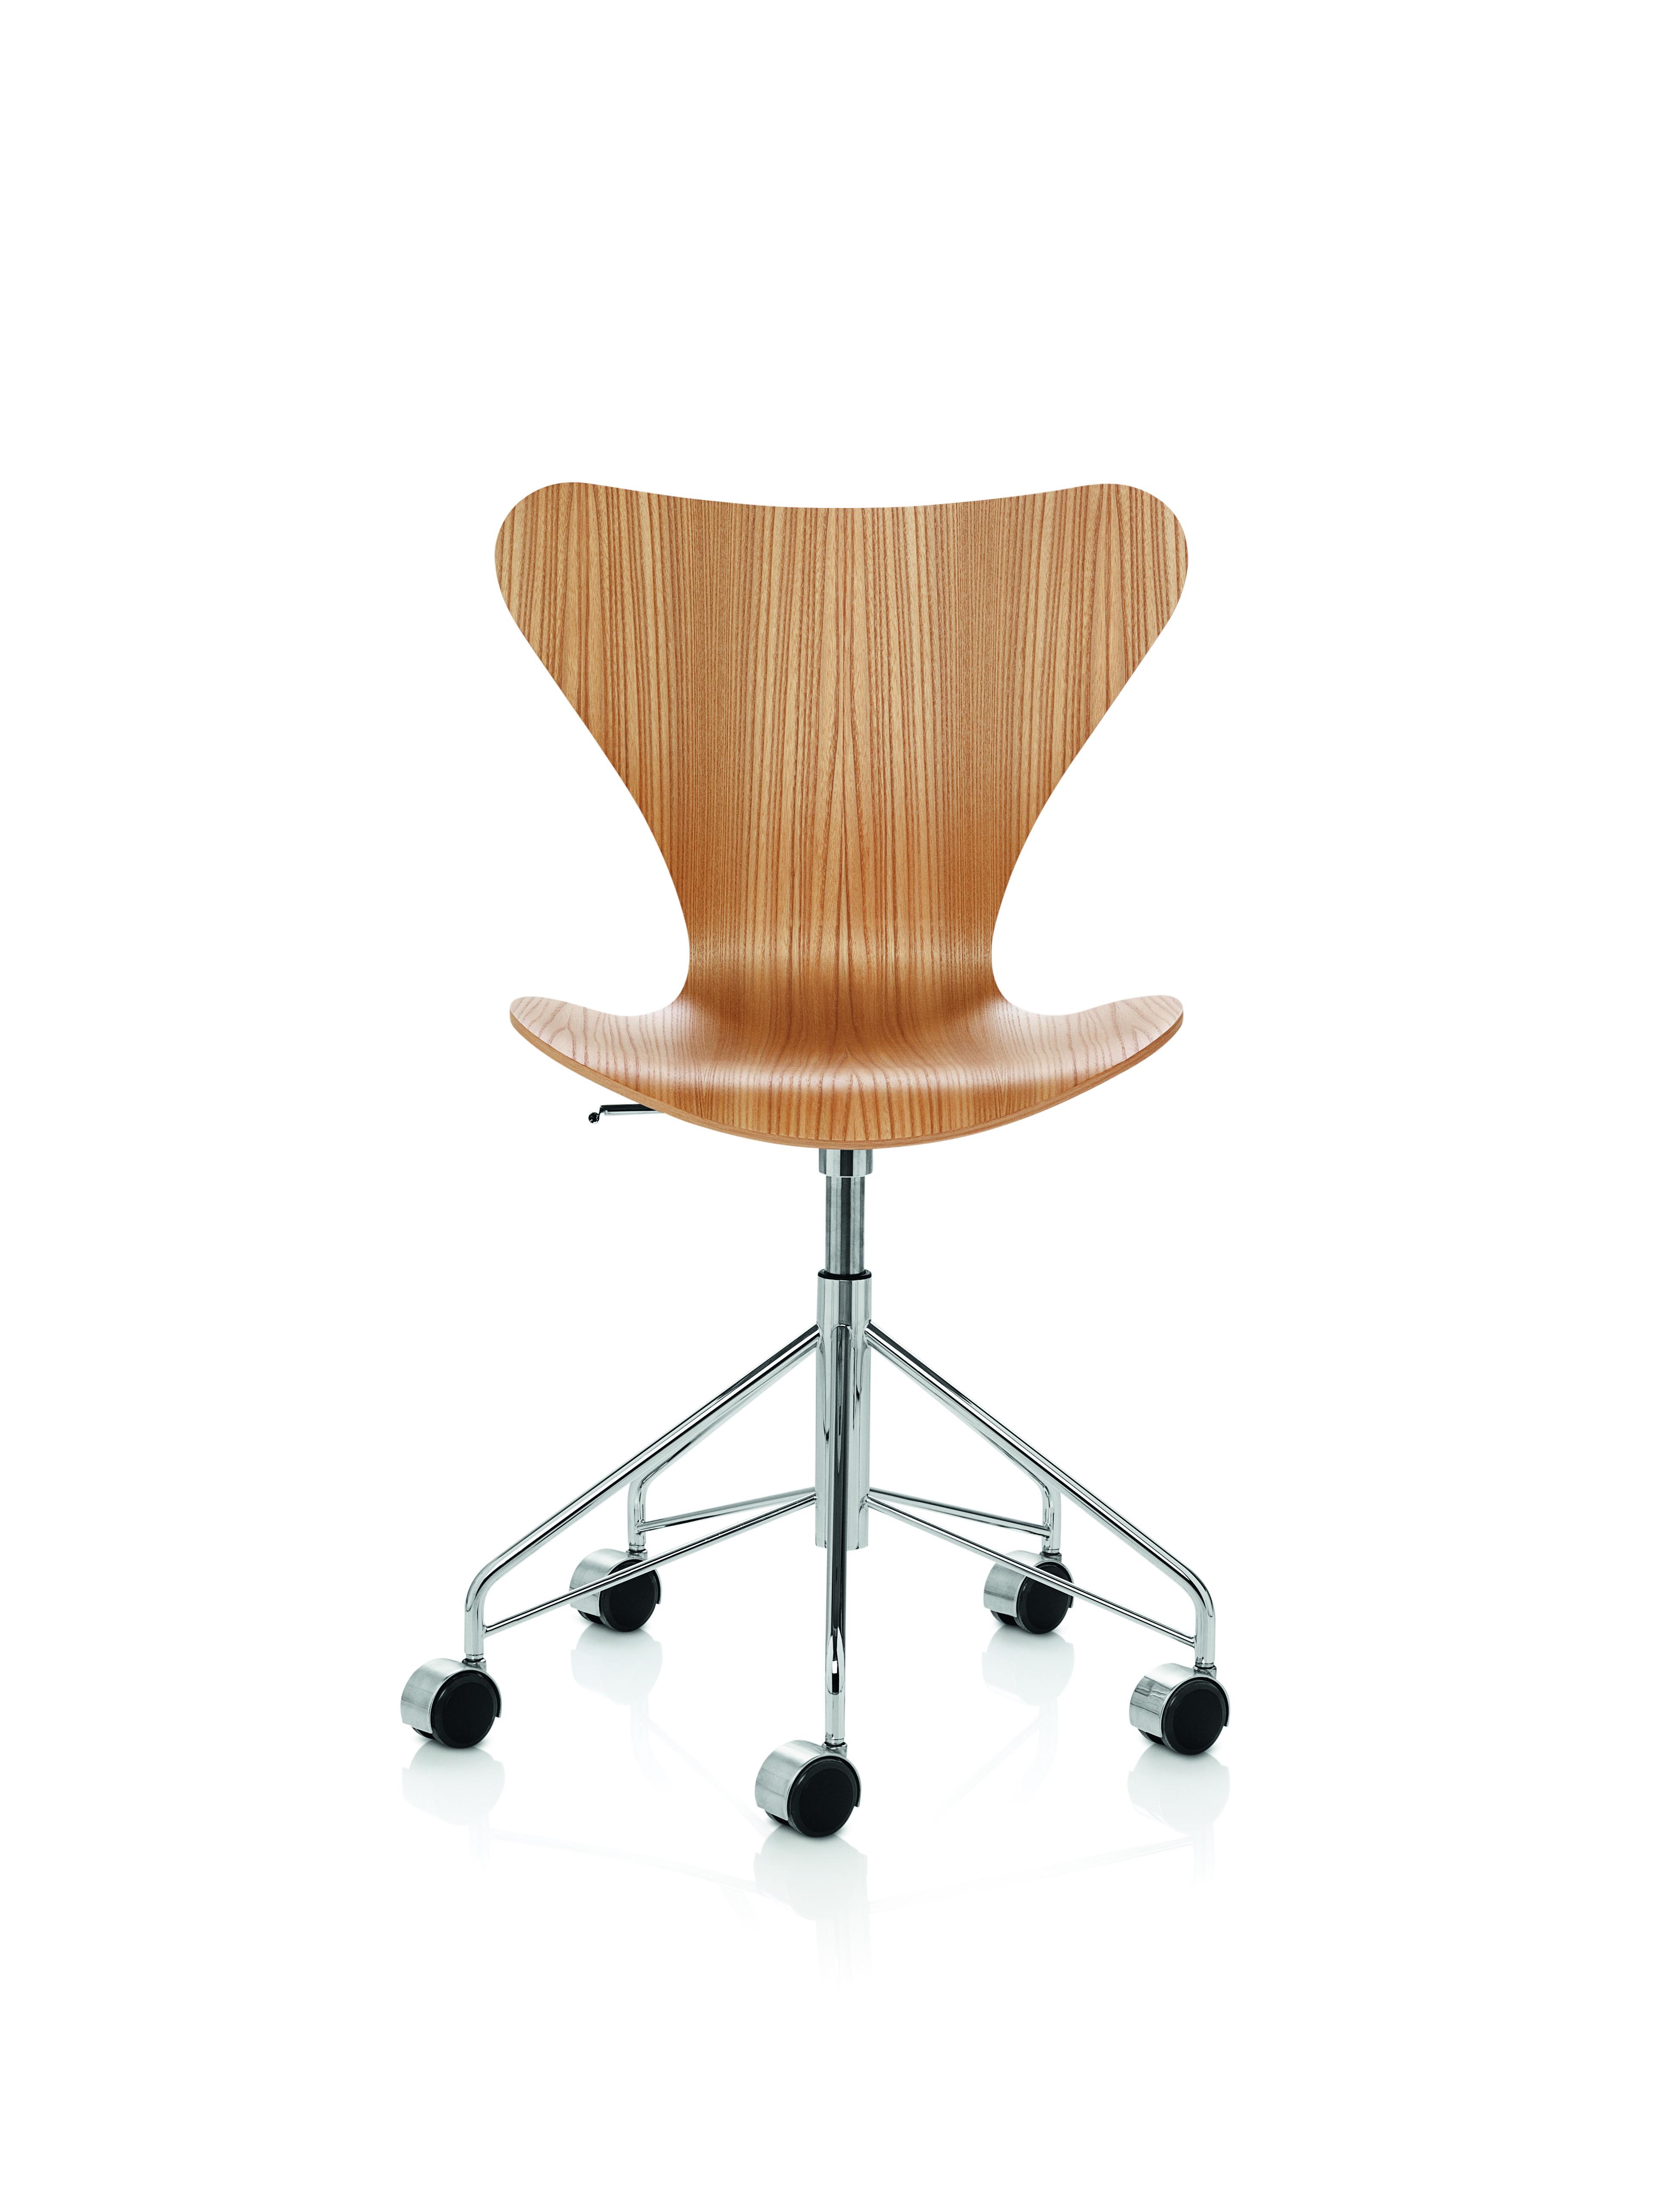 fritz hansen - chaise pivotante série 7 - arne jacobsen - Chaise Serie 7